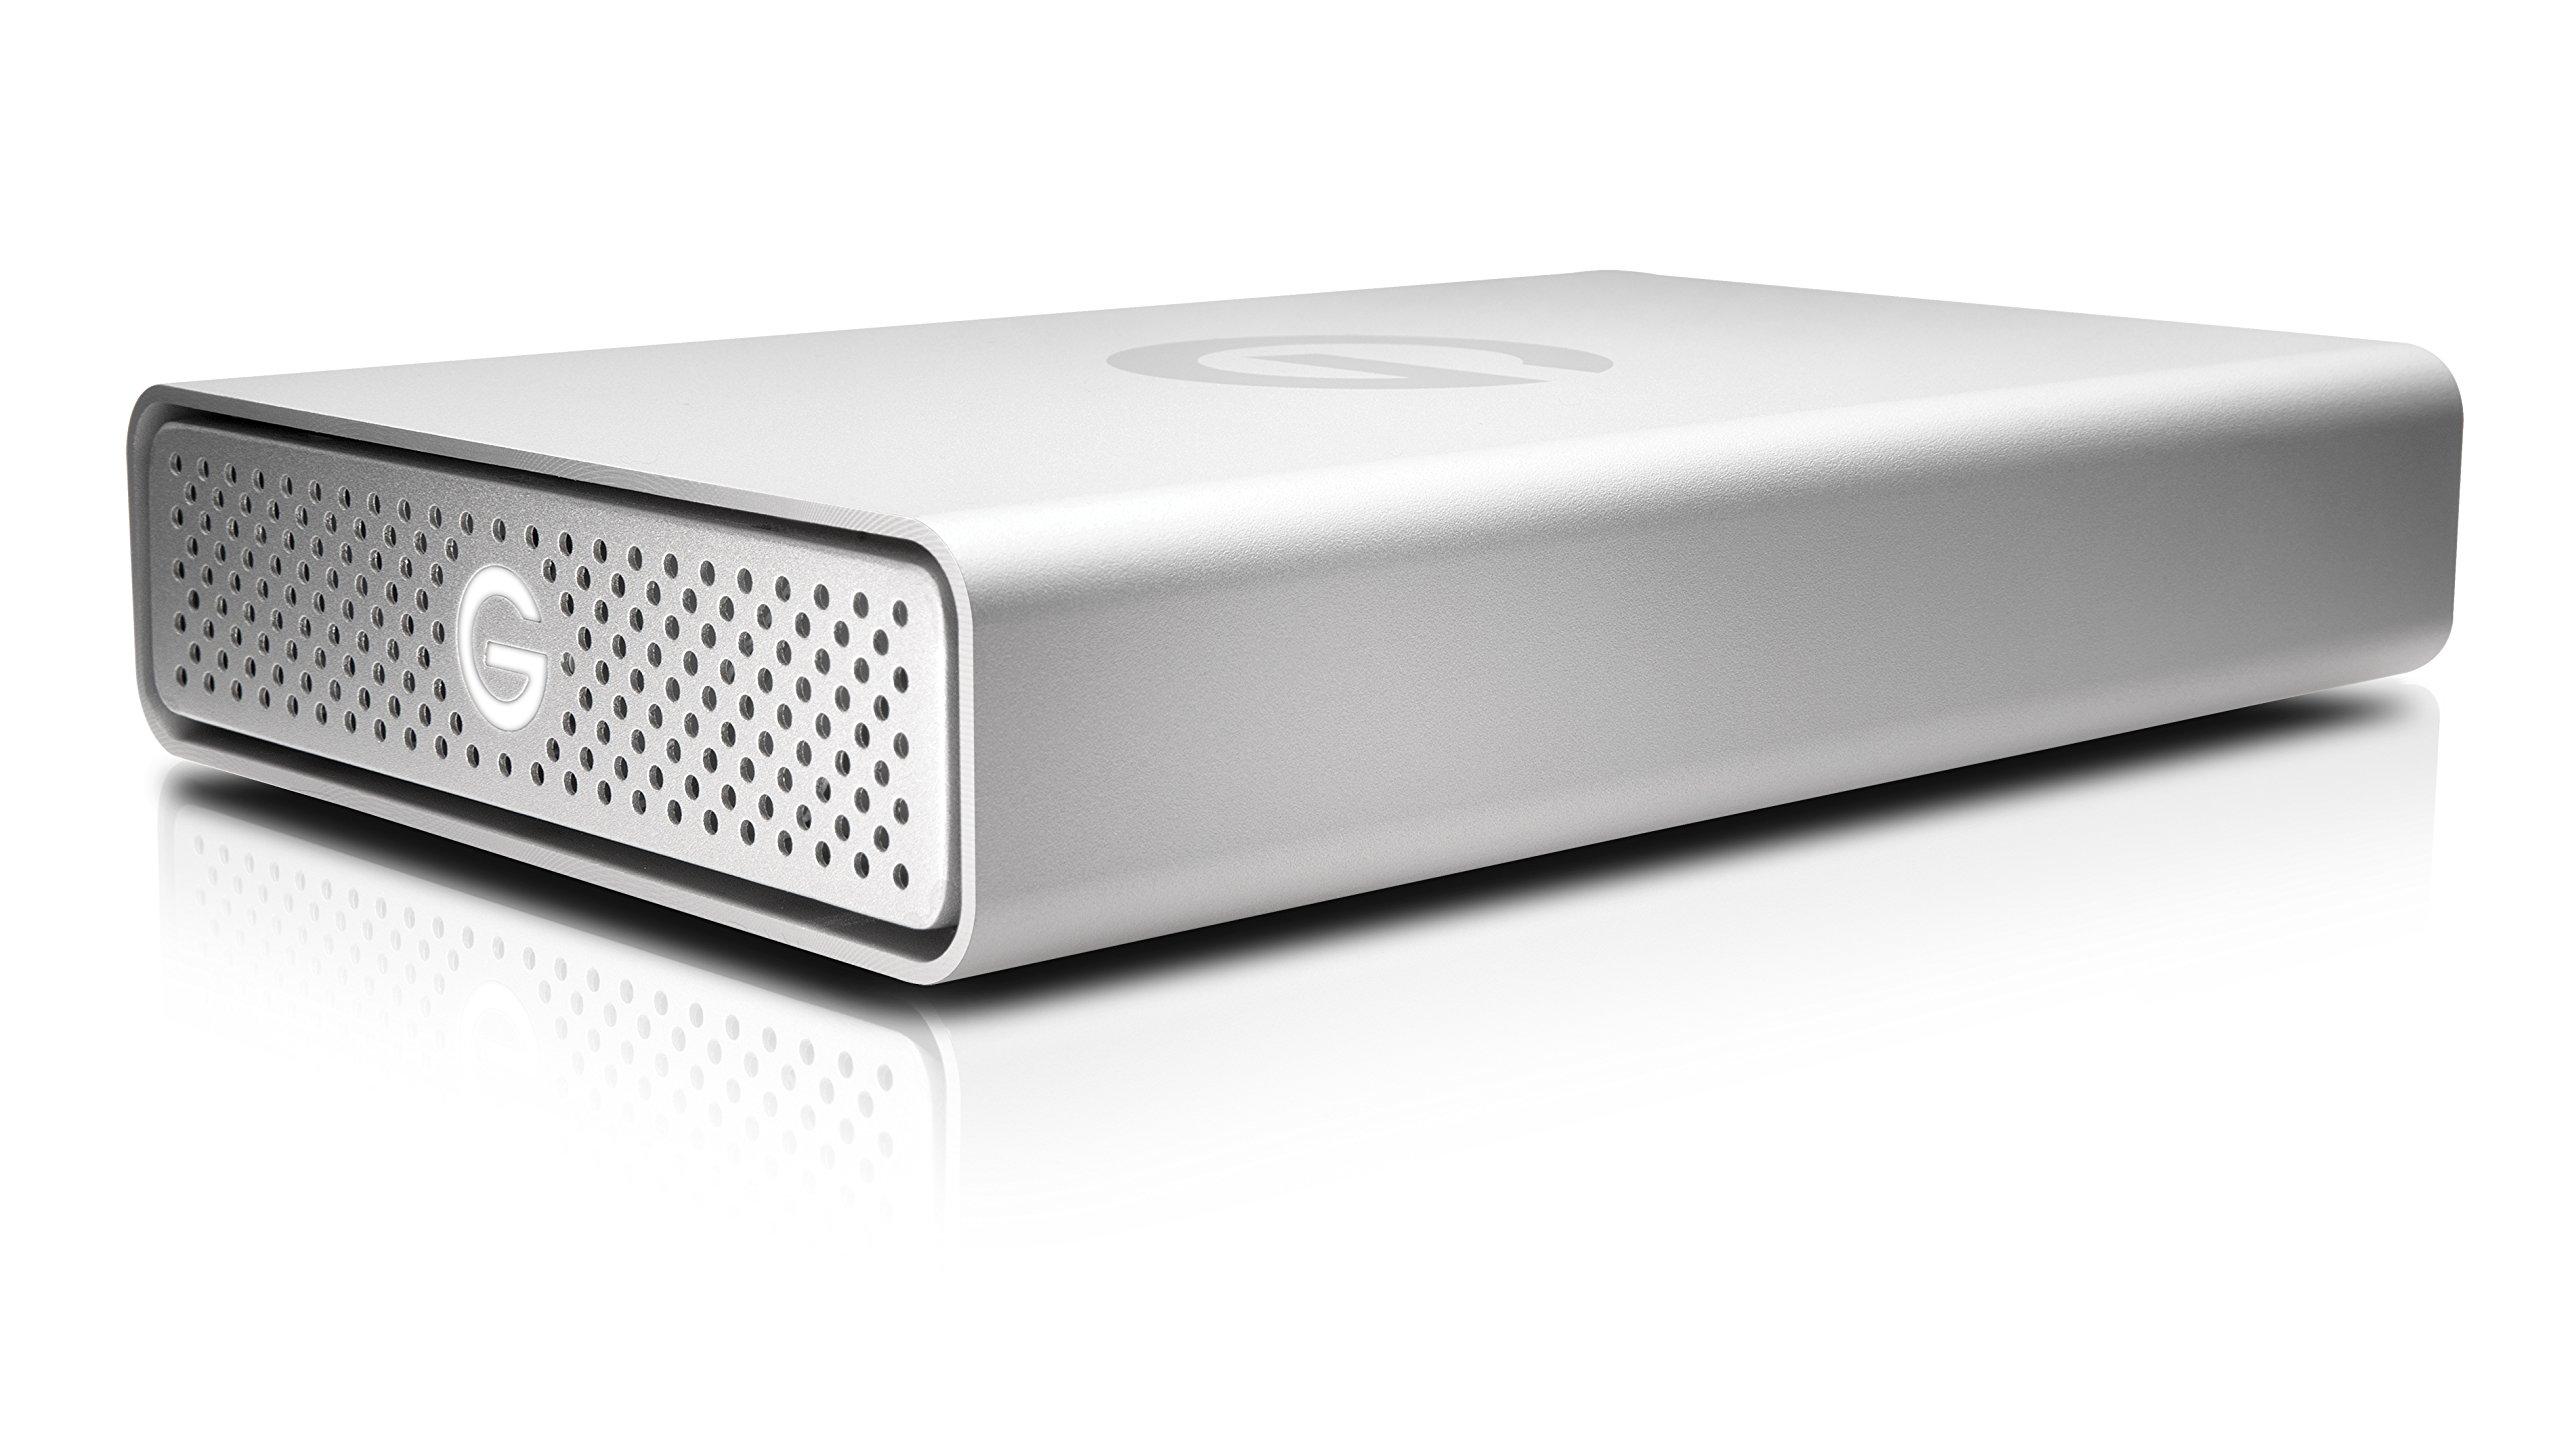 G-Technology G-DRIVE USB-C External Drive 4TB 0G05666 by G-Technology (Image #6)